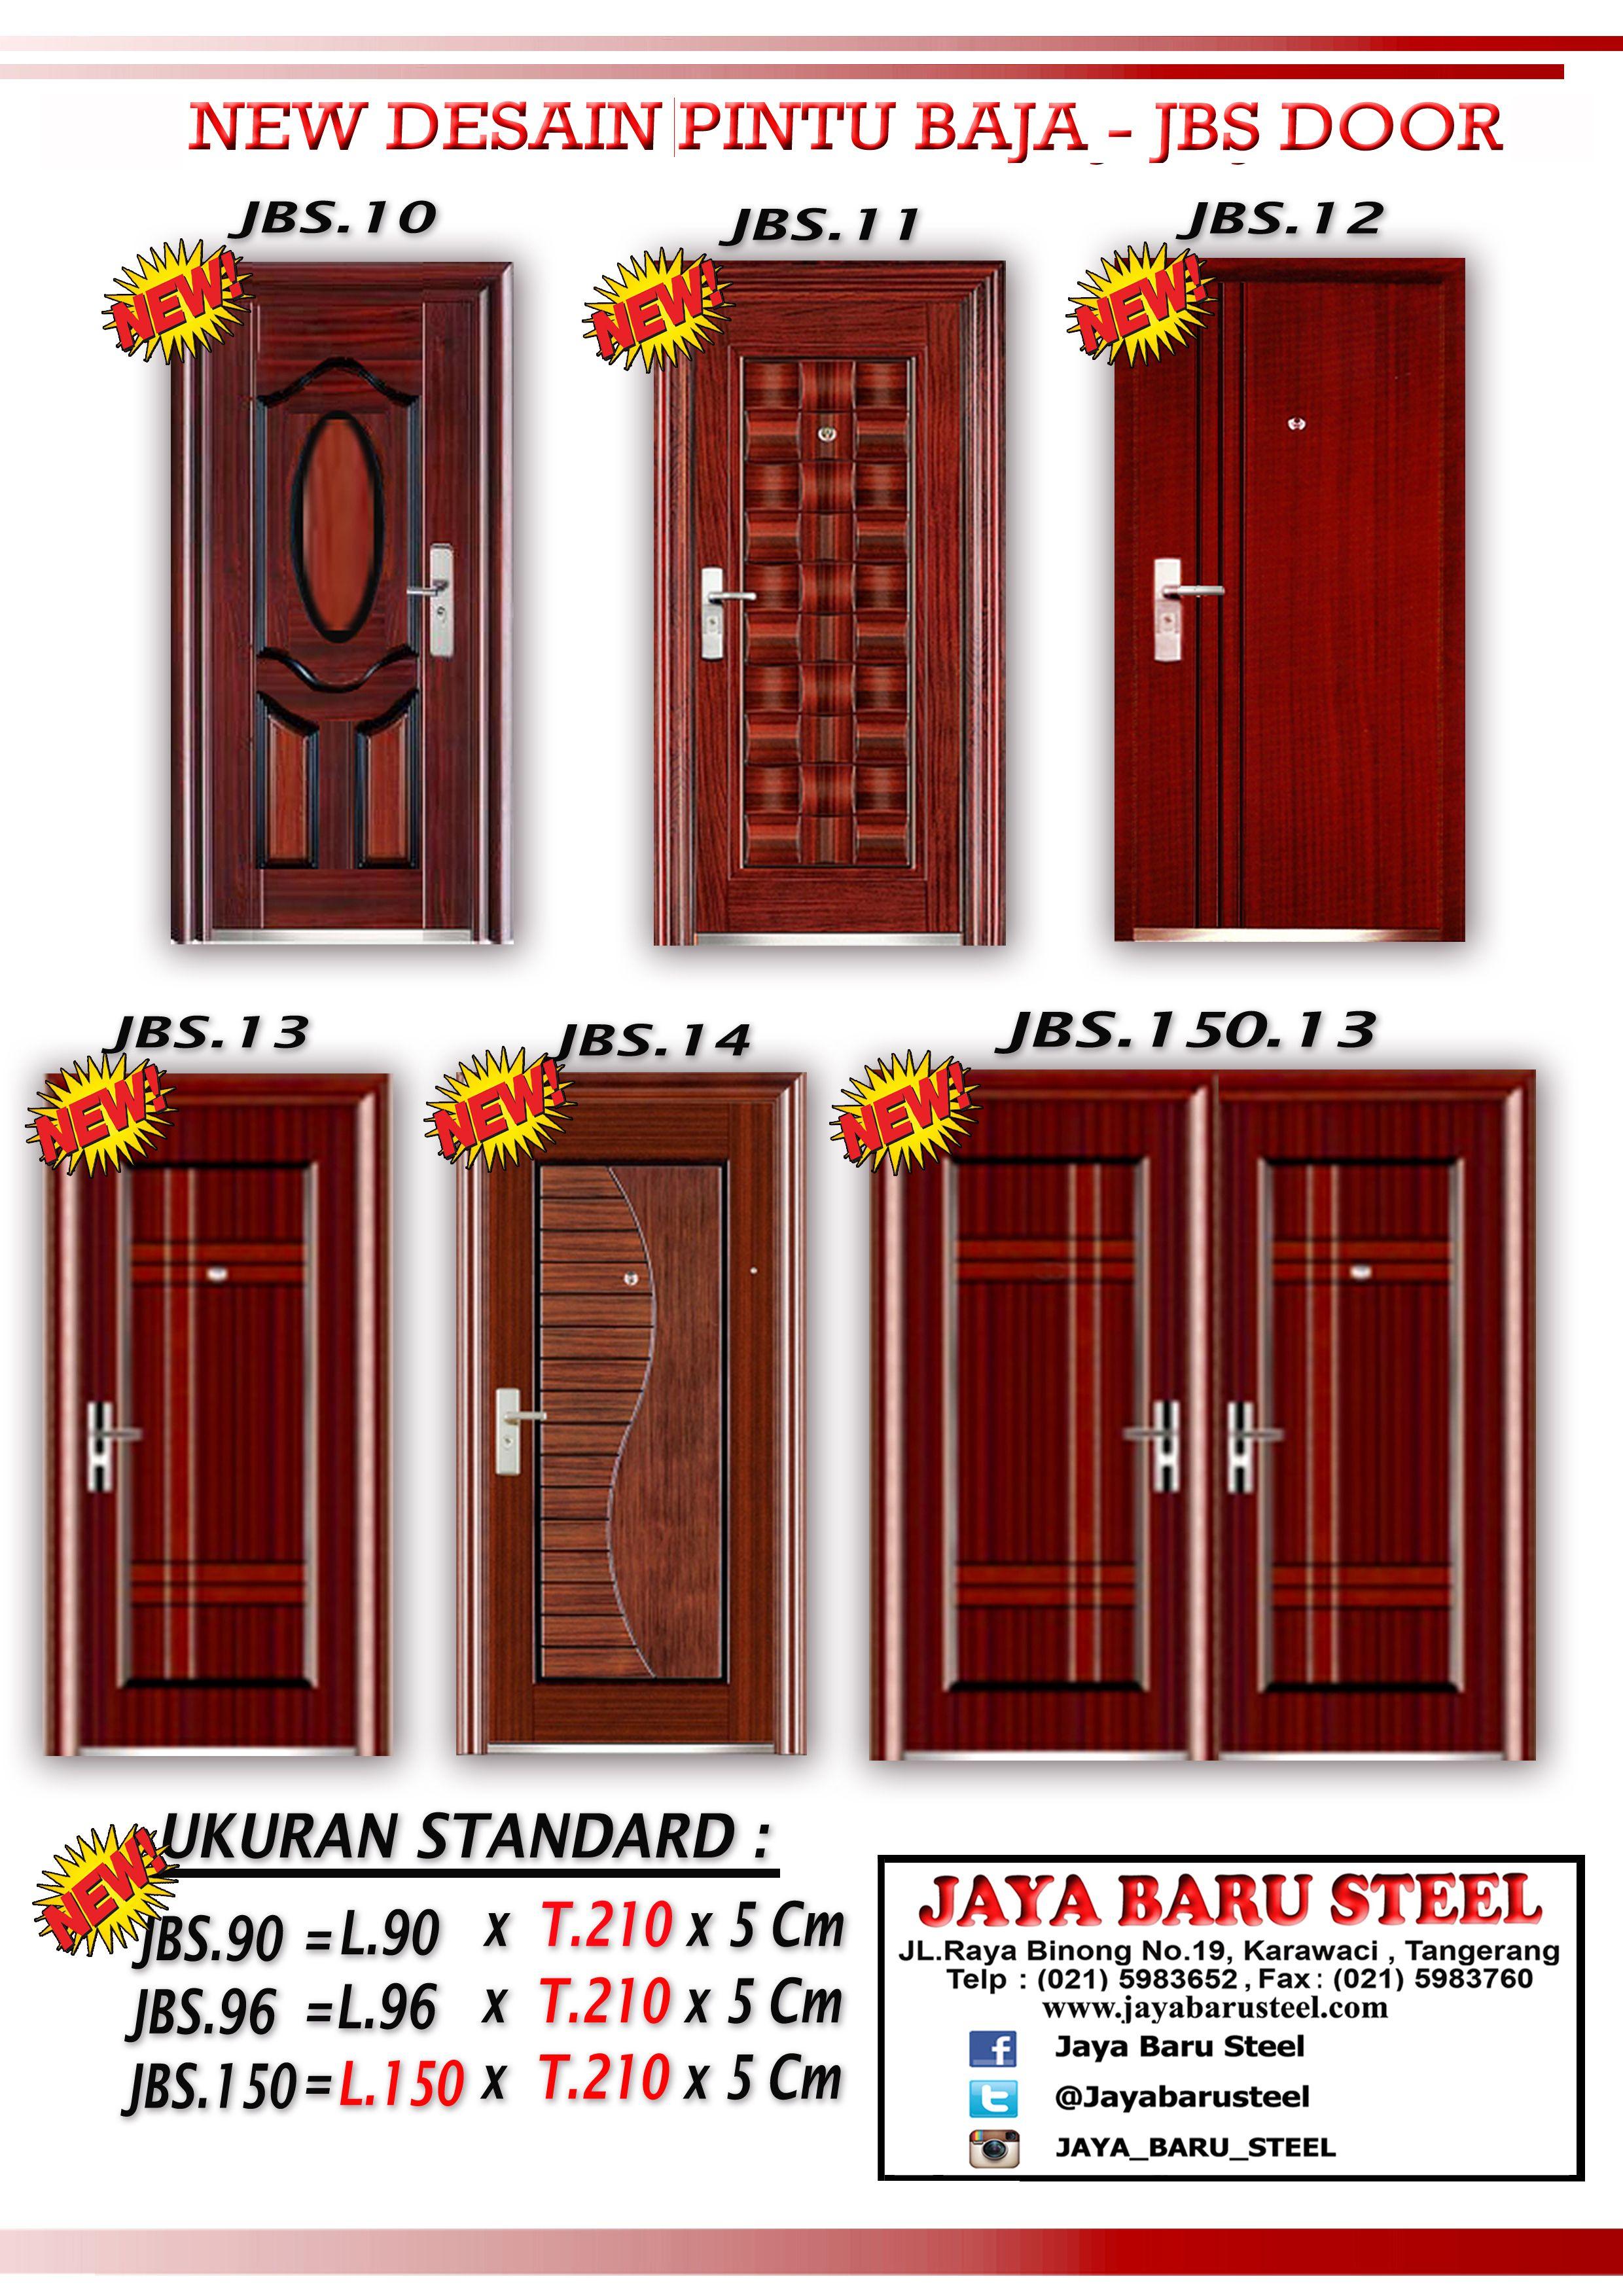 Alternatif Jual Pintu Rumah Minimalis Dari Baja JBS ...